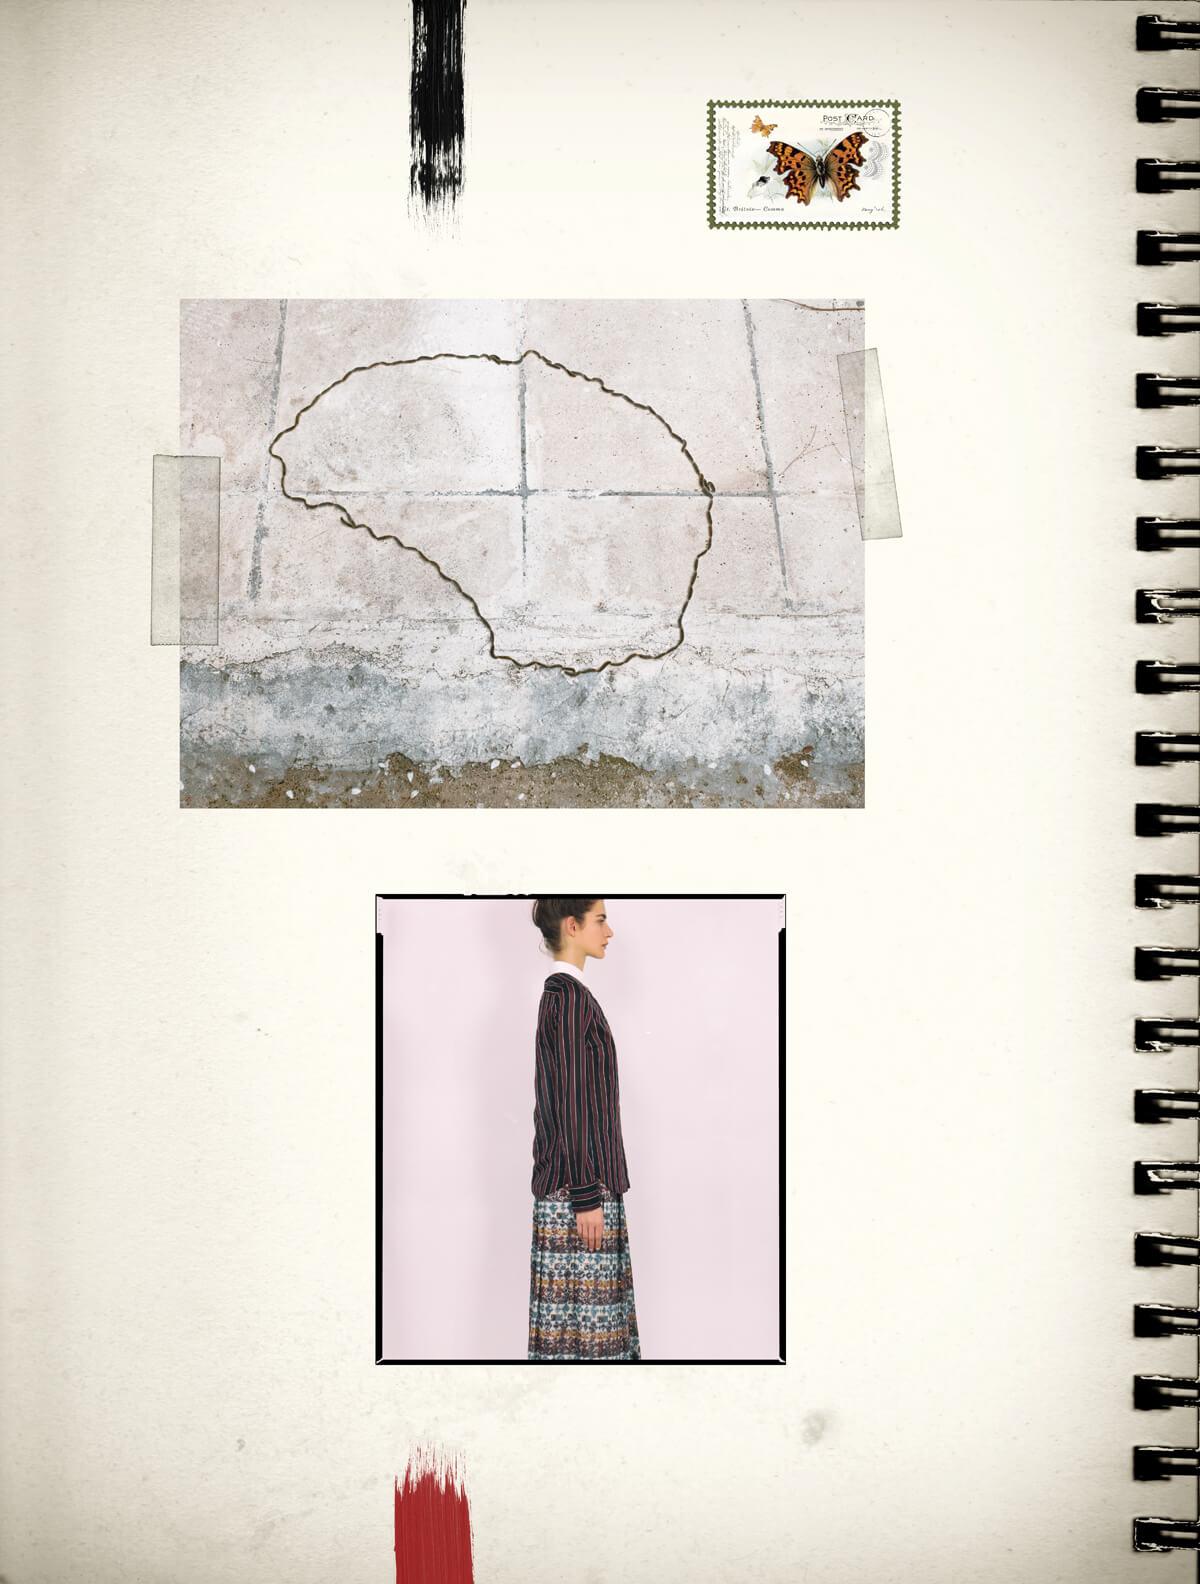 Sehnsucht - Alexei Siozov - Phases Magazine